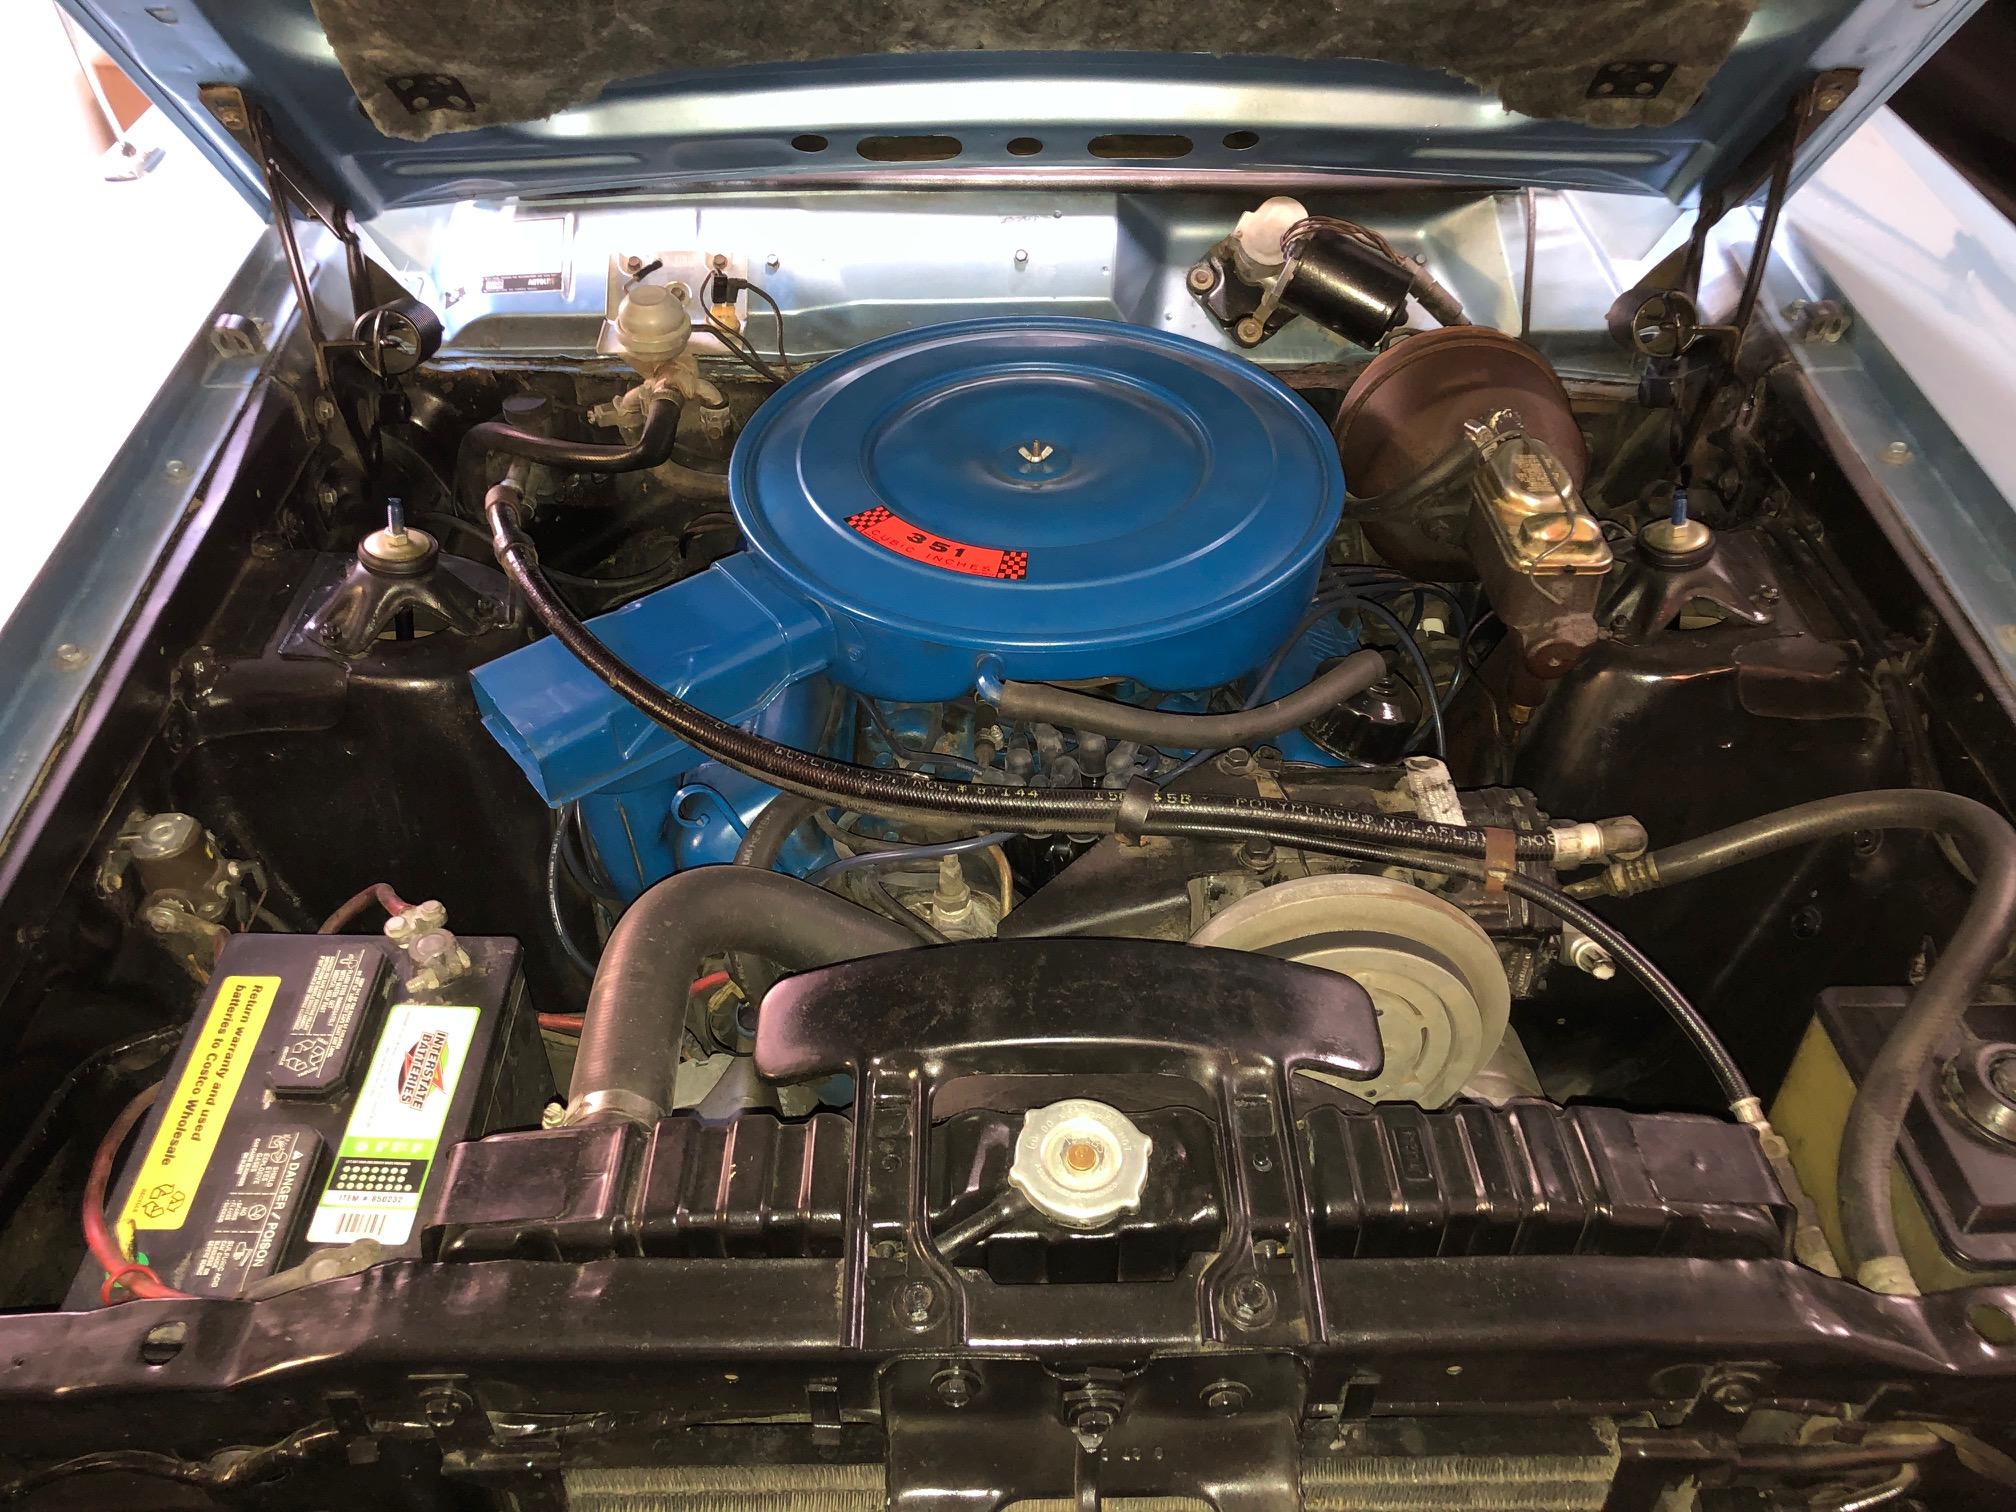 1969 Ford Torino engine